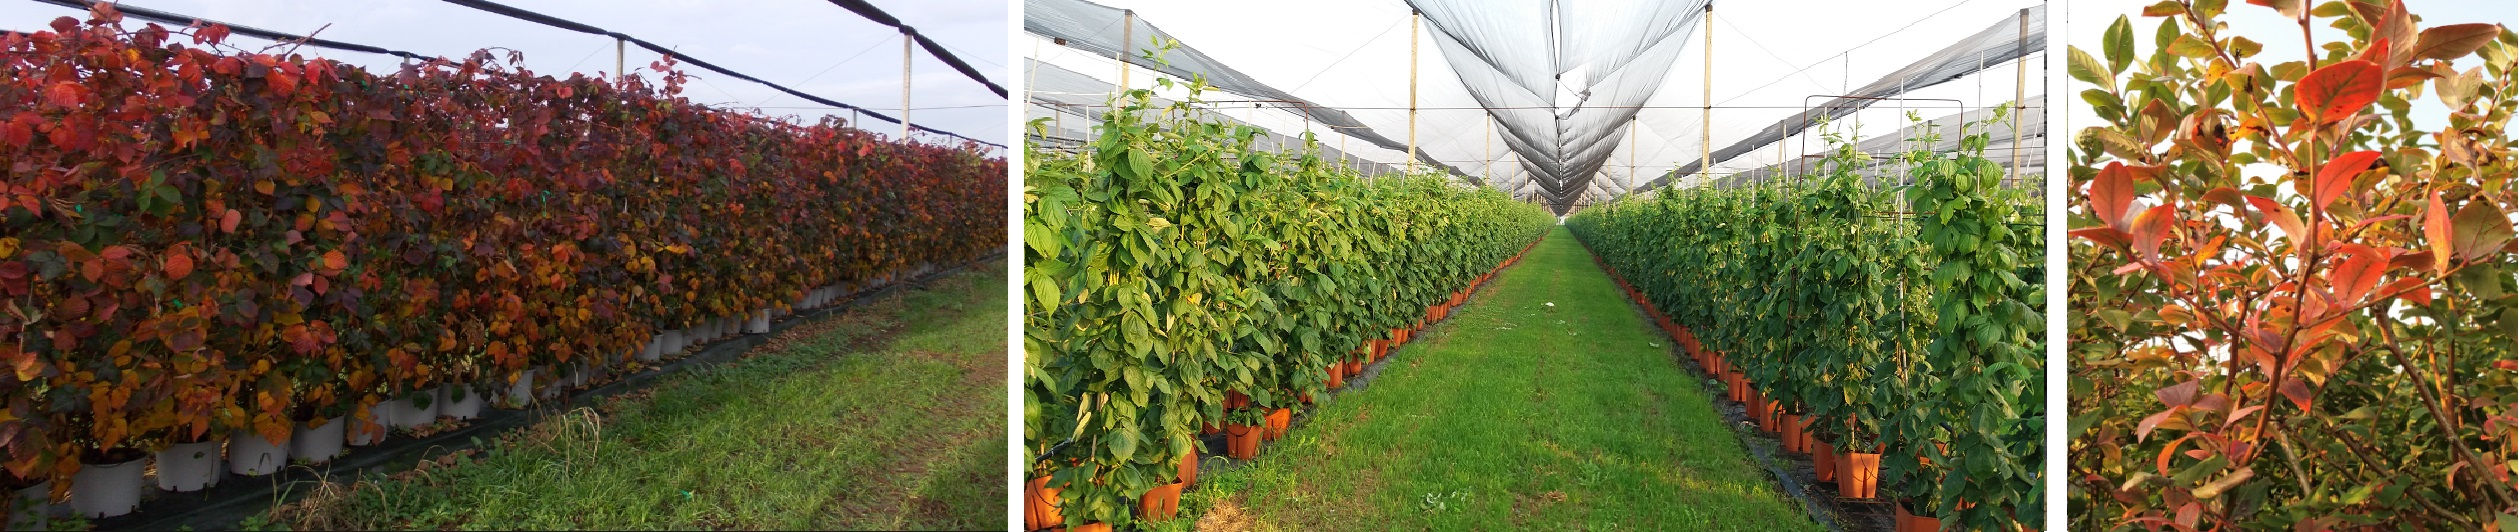 piante-frutti-di-bosco-vivaio-berryverona